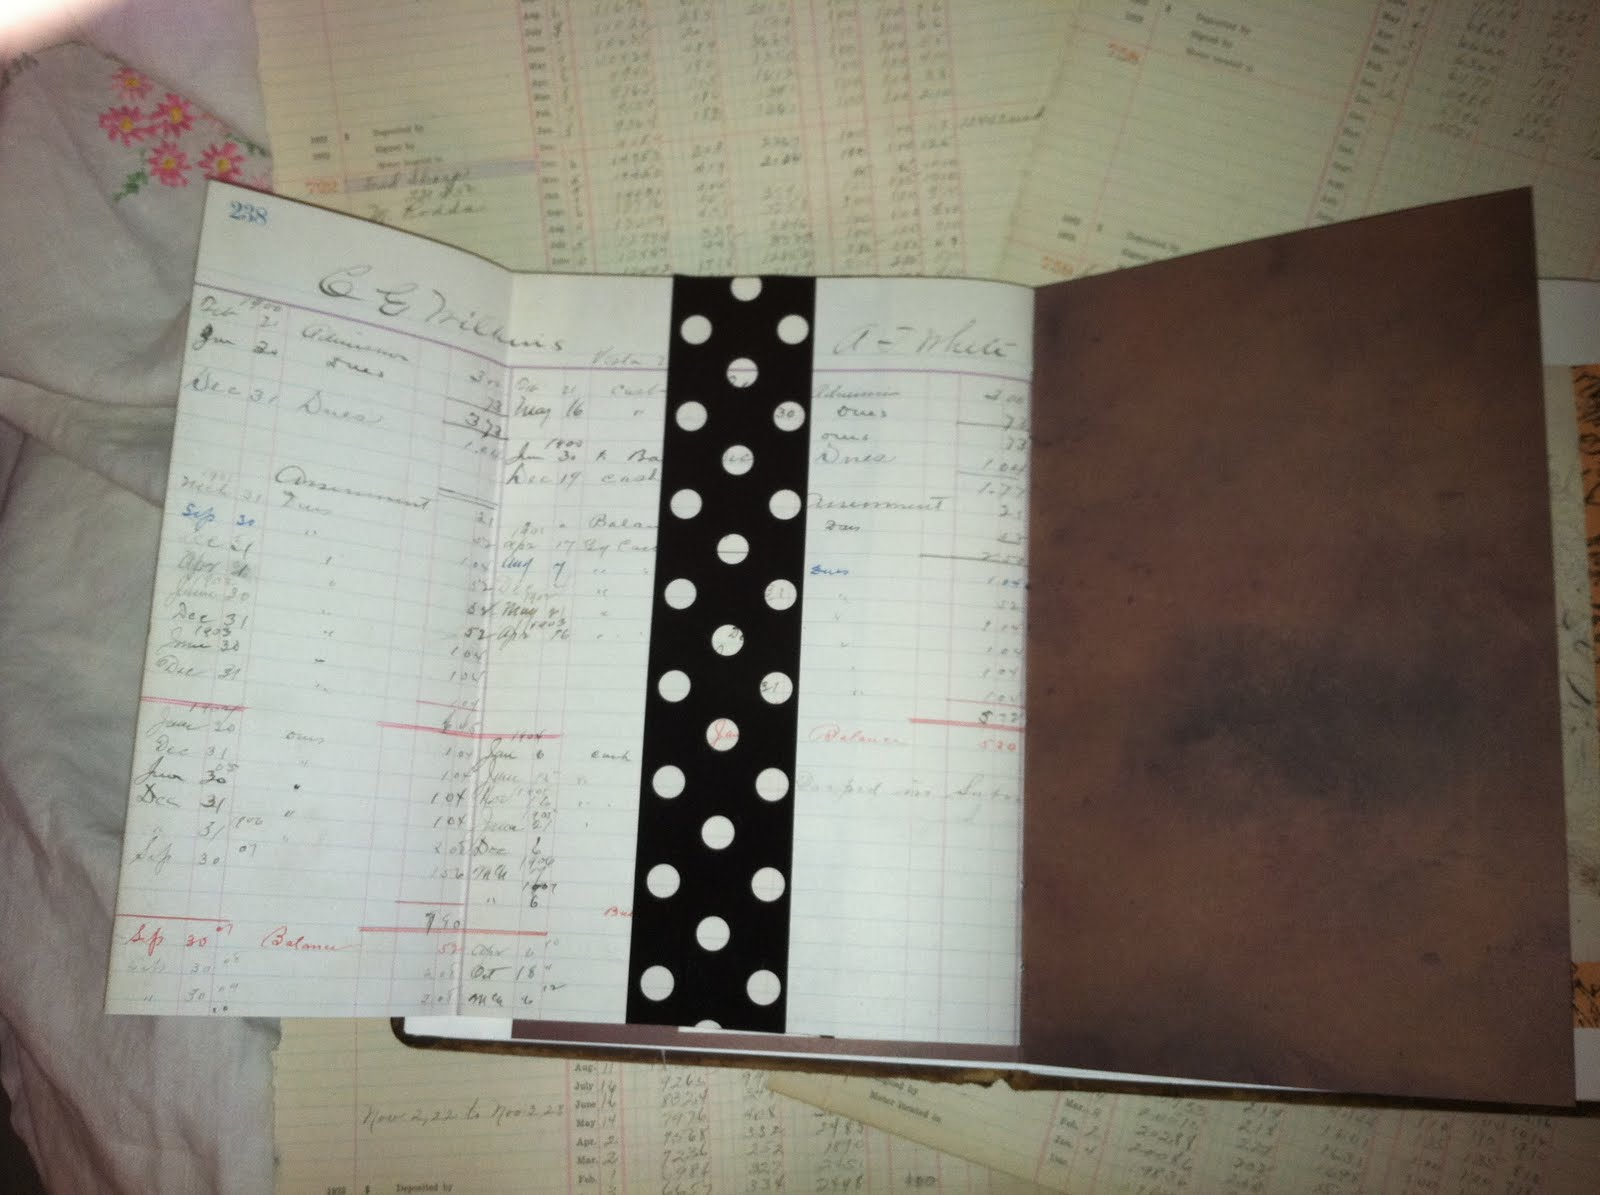 http://4.bp.blogspot.com/-rQ2An_DrfMc/TkFpj_0Tg6I/AAAAAAAAA8w/IXgU_Q79zpA/s1600/Leather+Antique+Pao+Album+Journal+020.JPG